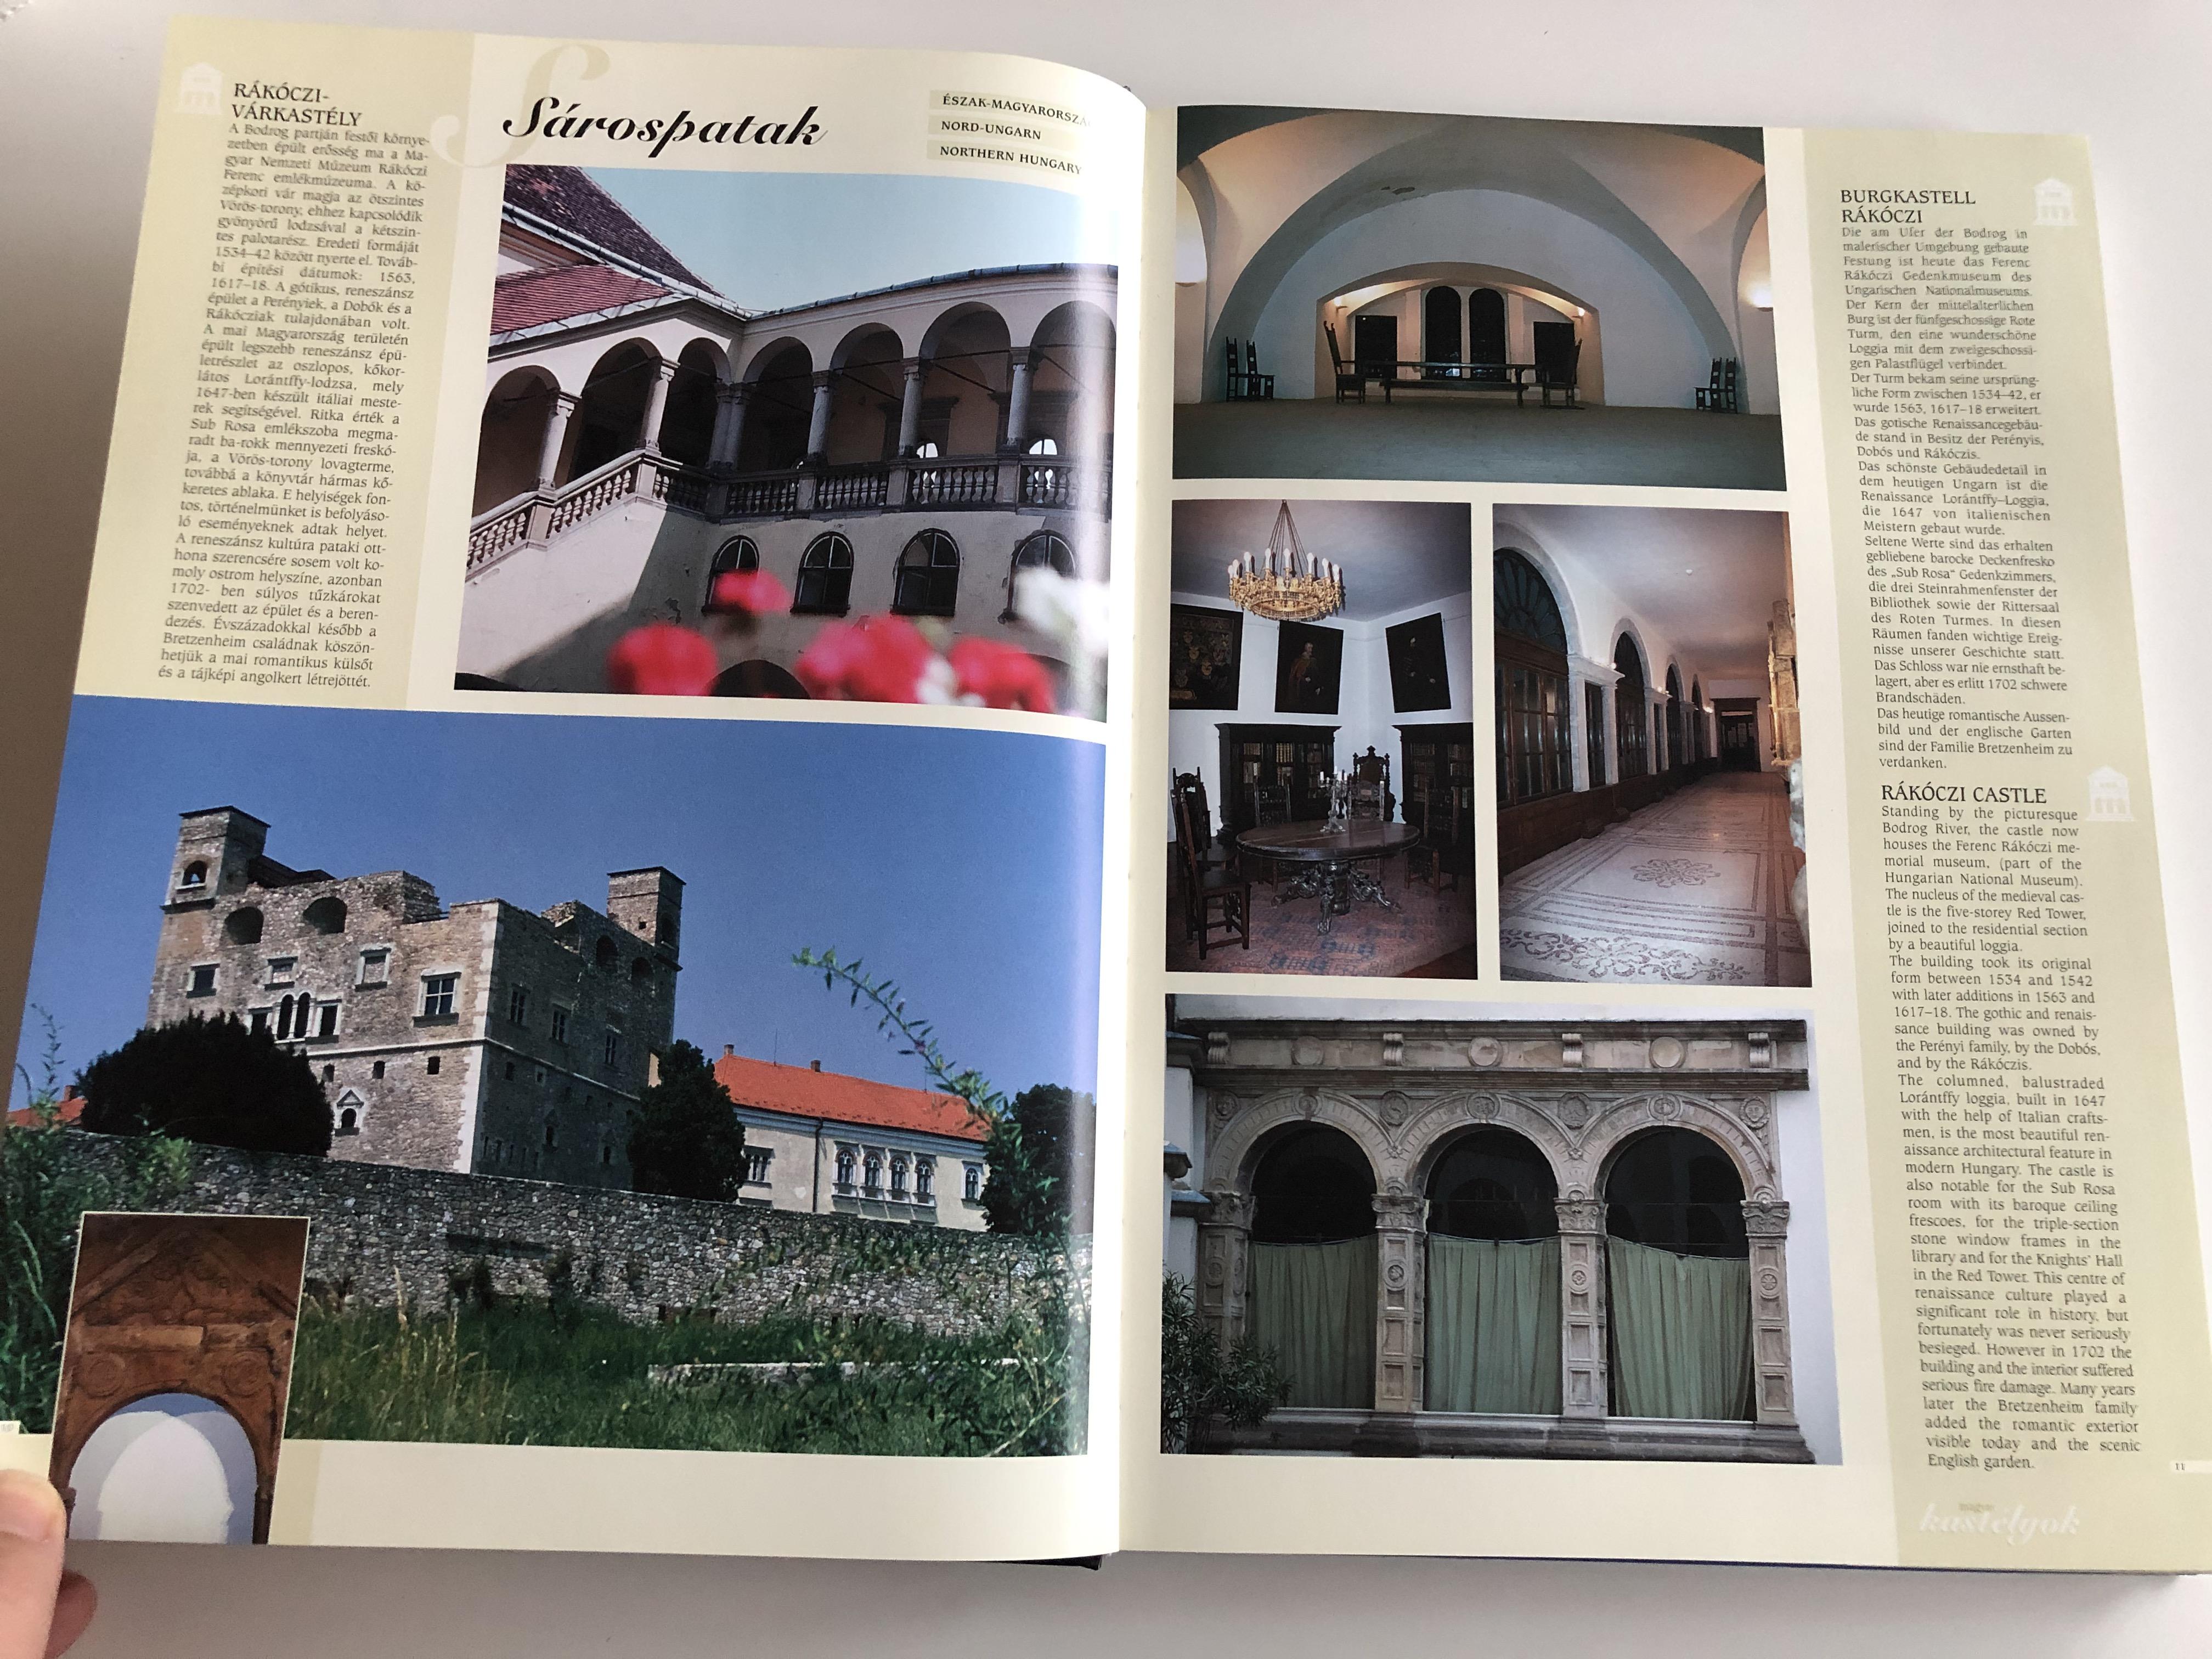 magyar-kast-lyok-by-bagyinski-zolt-n-one-hundred-hungarian-castles-and-mansions-7.jpg